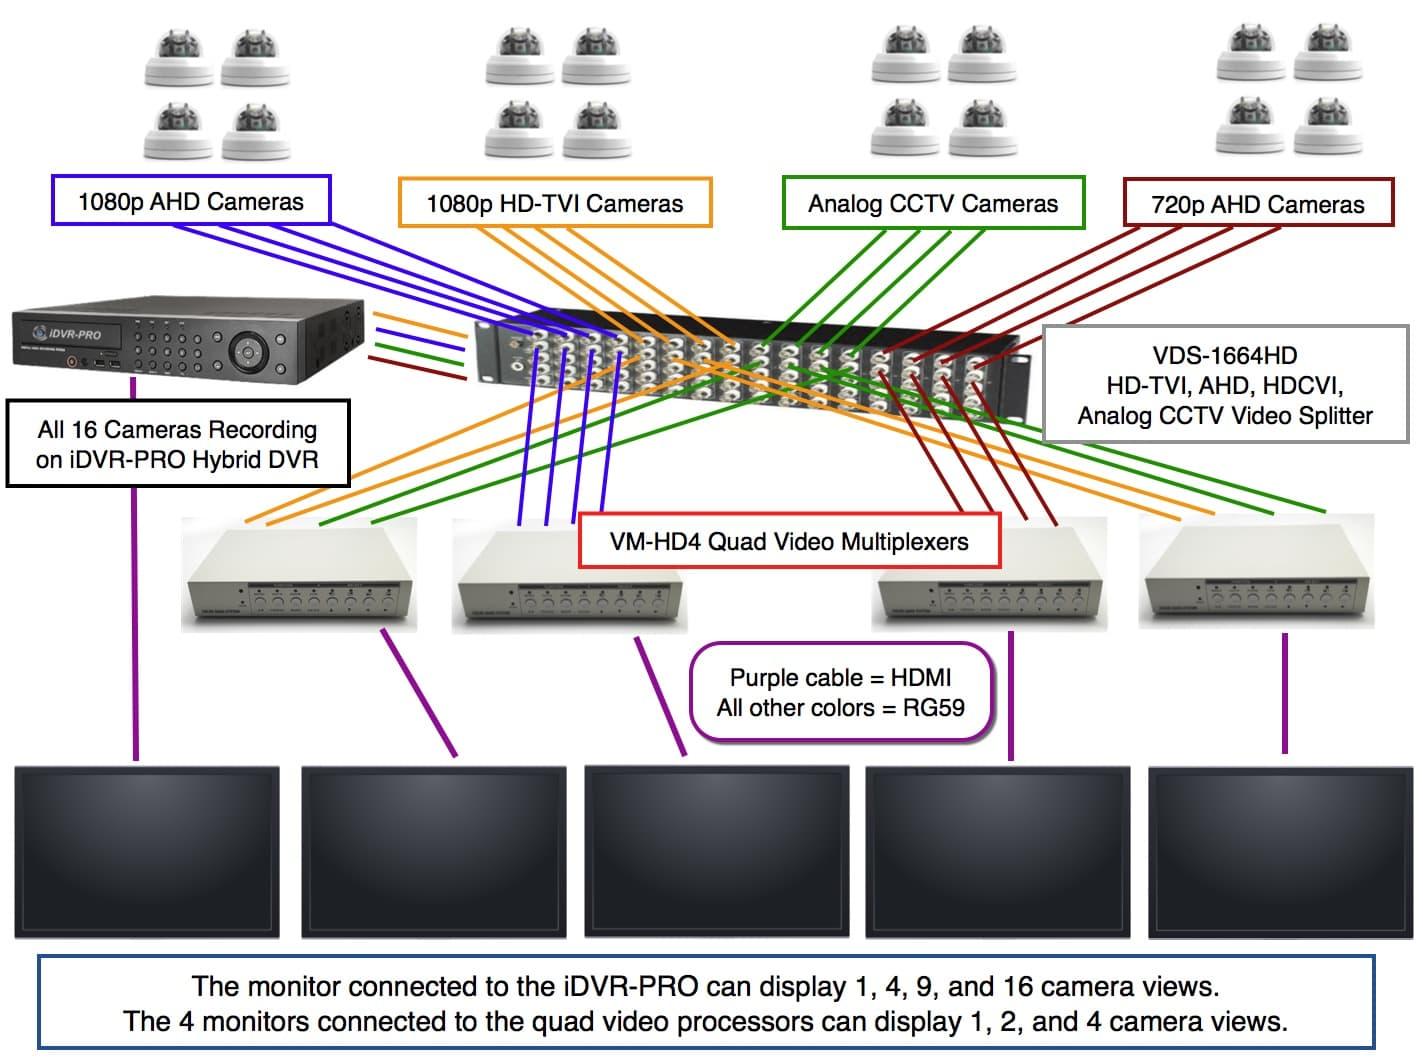 hight resolution of cctv wiring diagram connection wiring diagram view cctv wiring diagram connection cctv wiring diagram connection